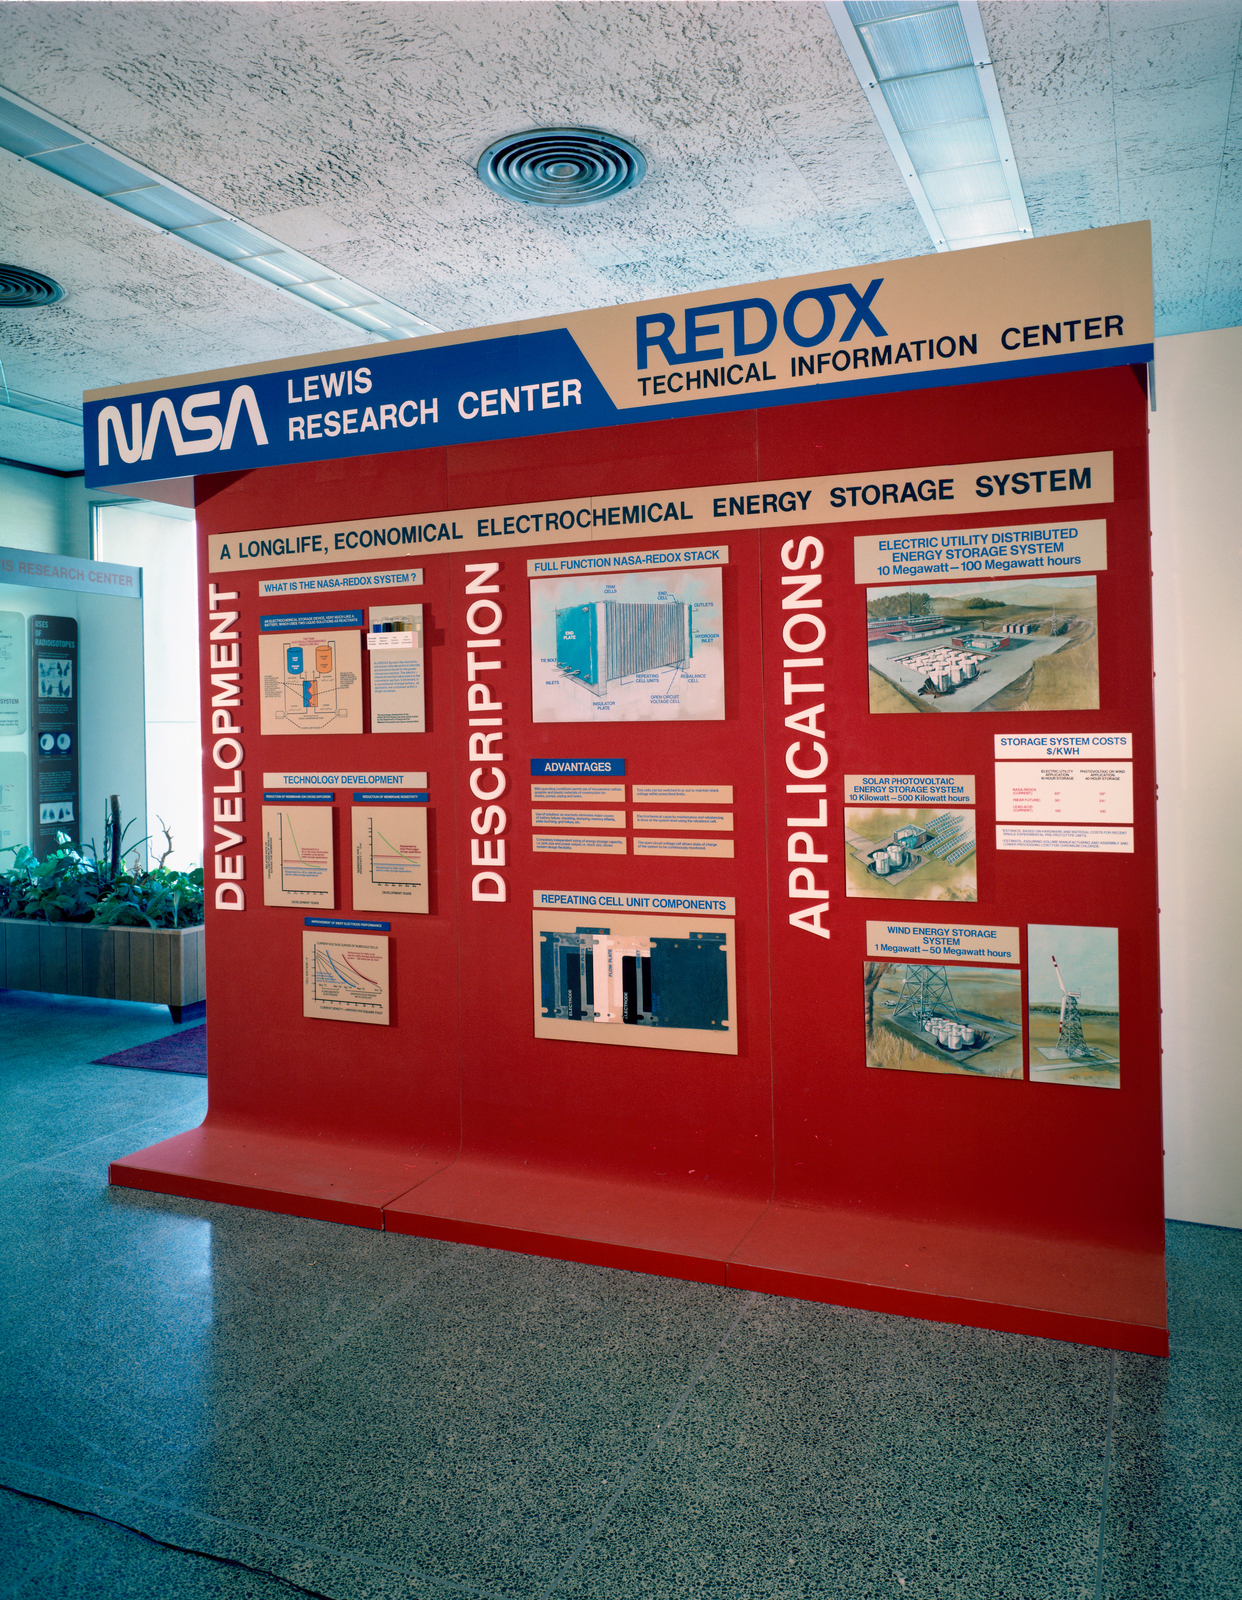 REDOX DISPLAYS